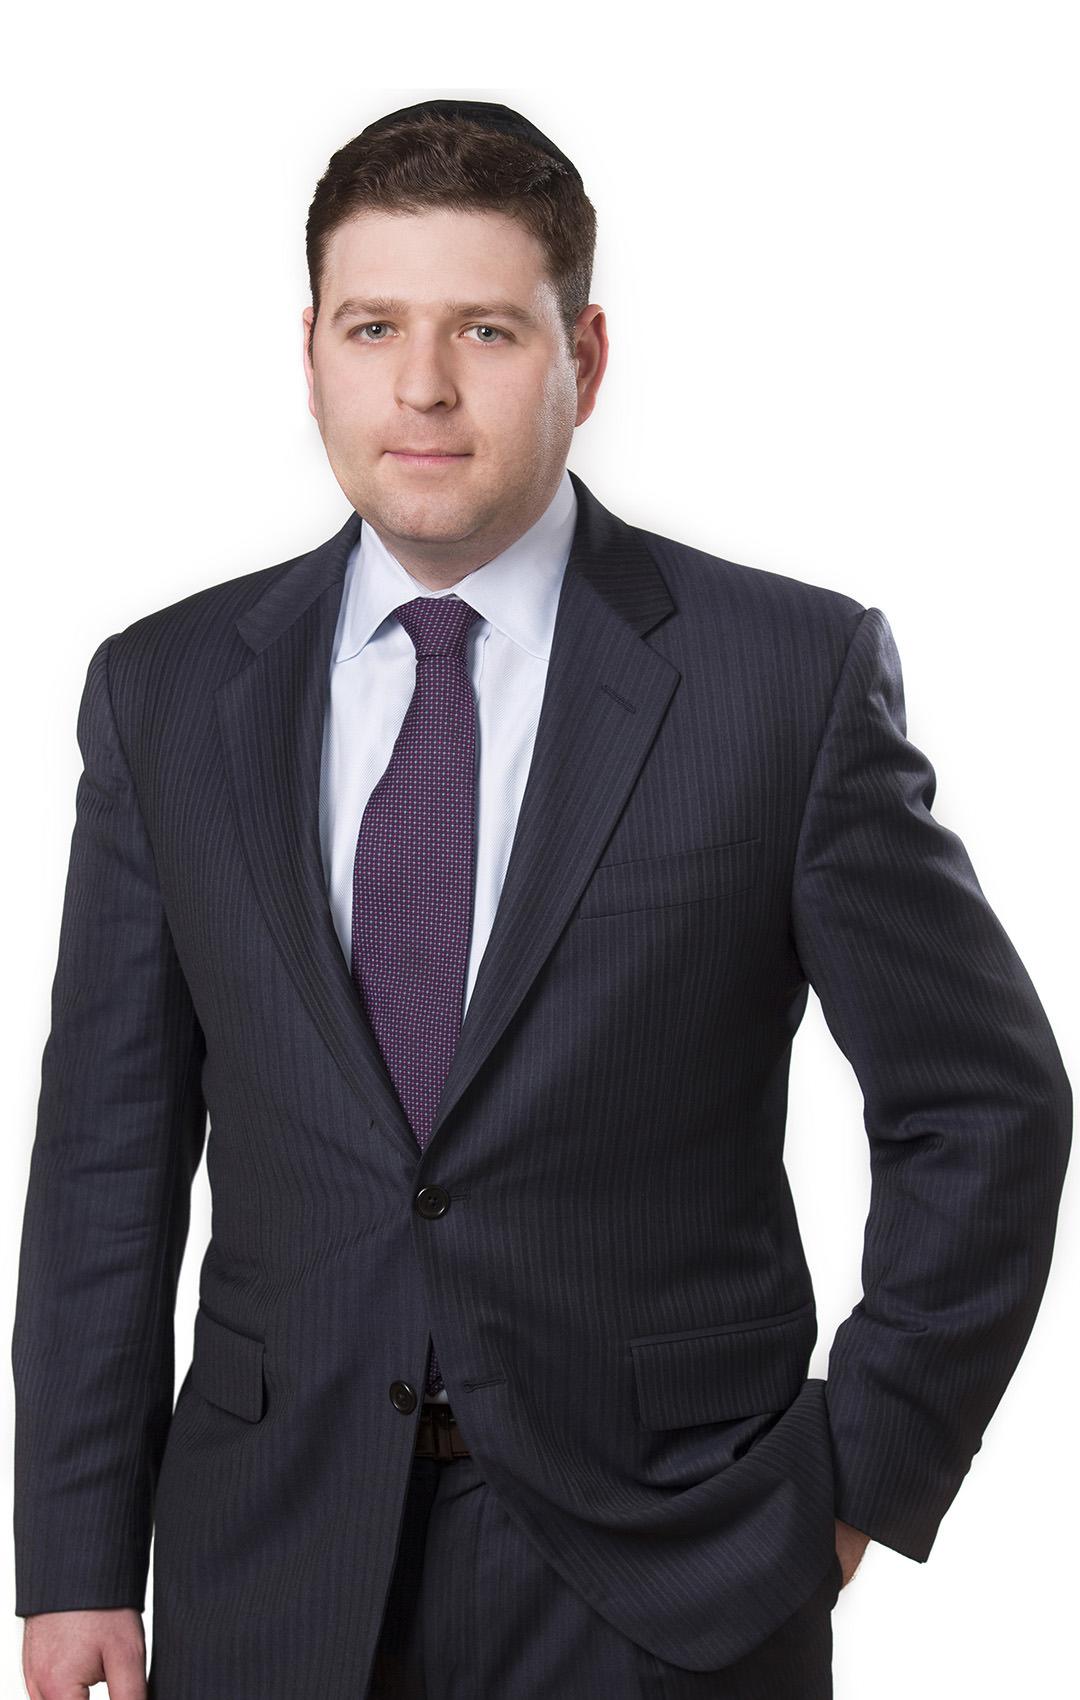 M. David Possick